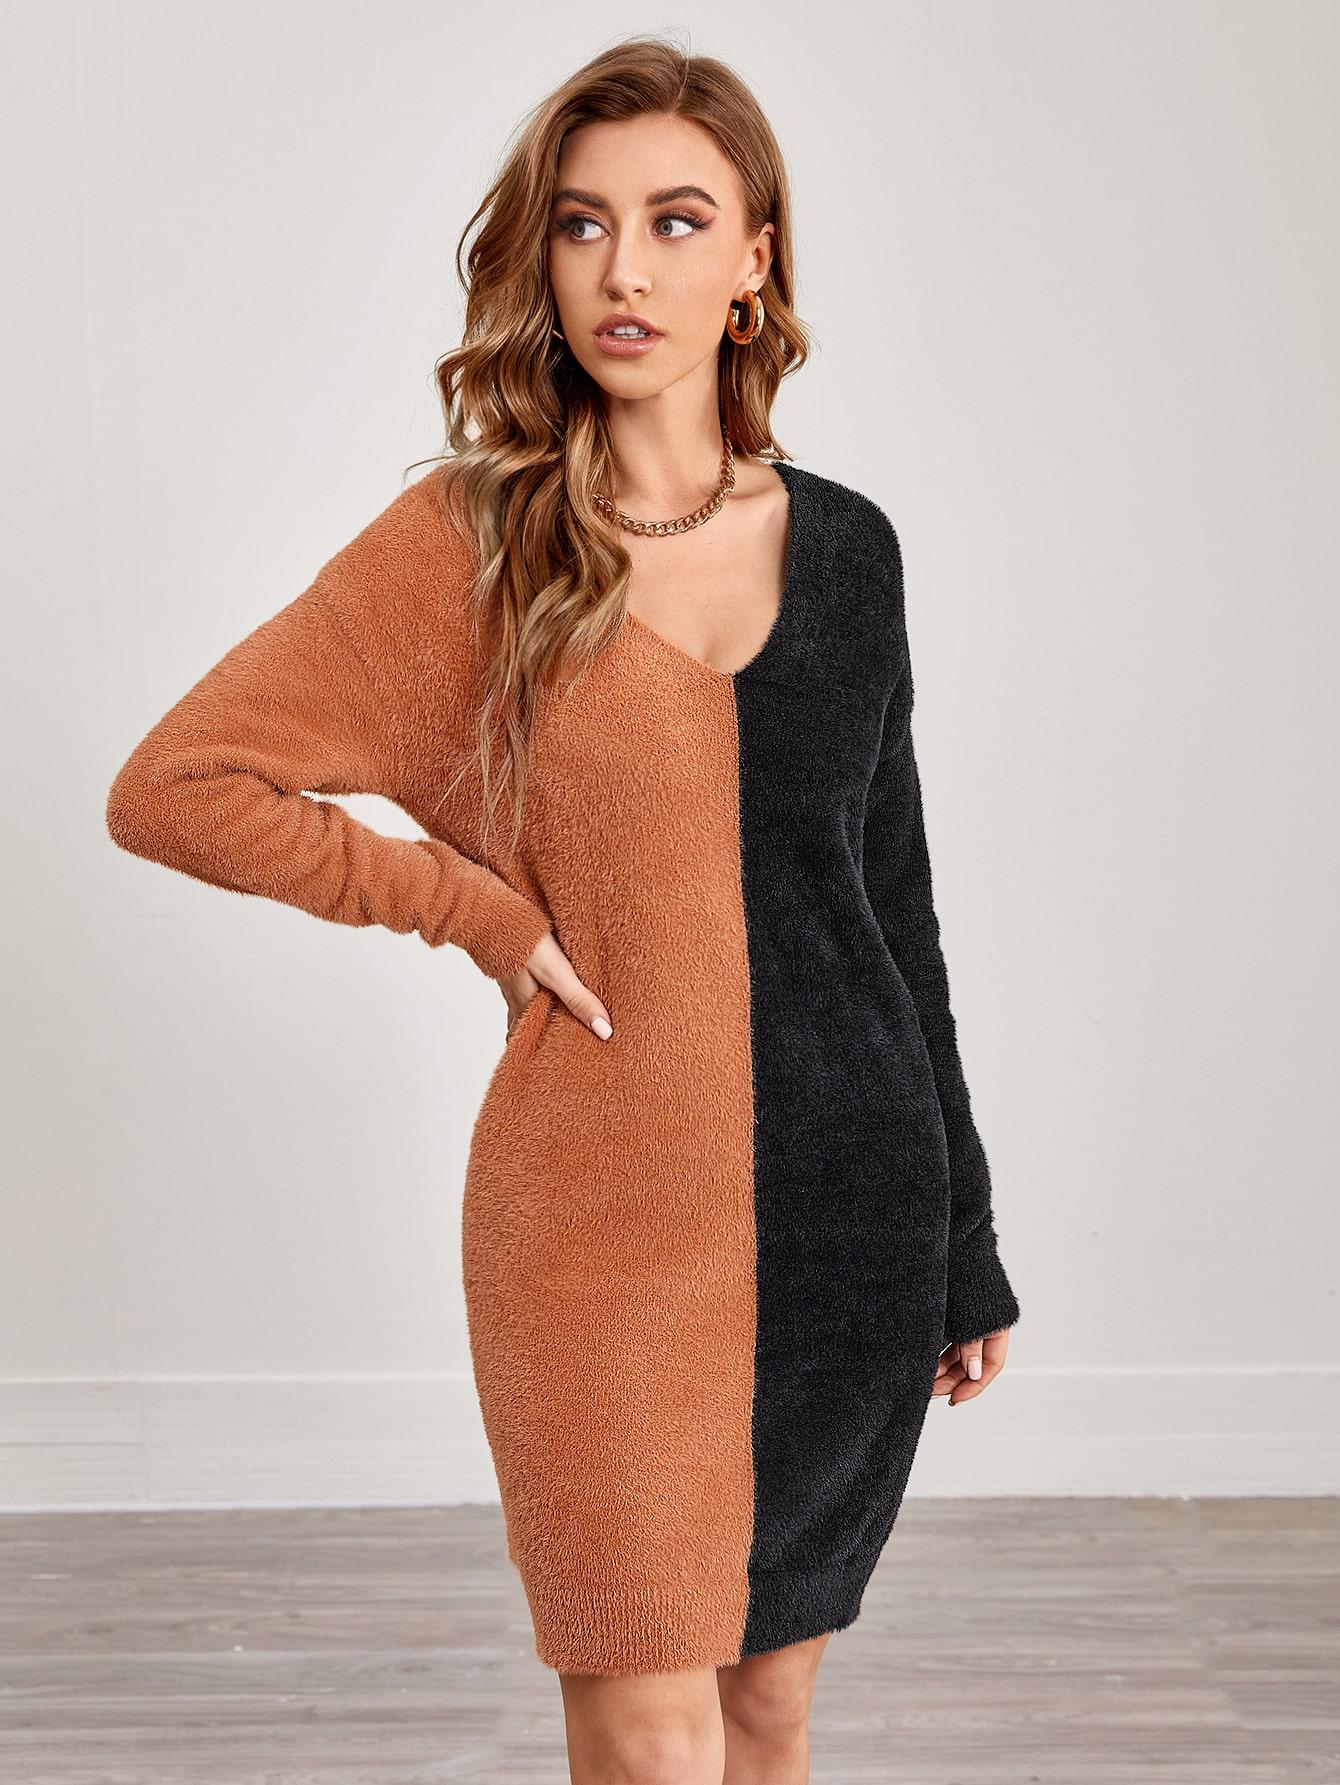 V-neck Drop Shoulder Two Tone Fluffy Knit Sweater Dress thumbnail